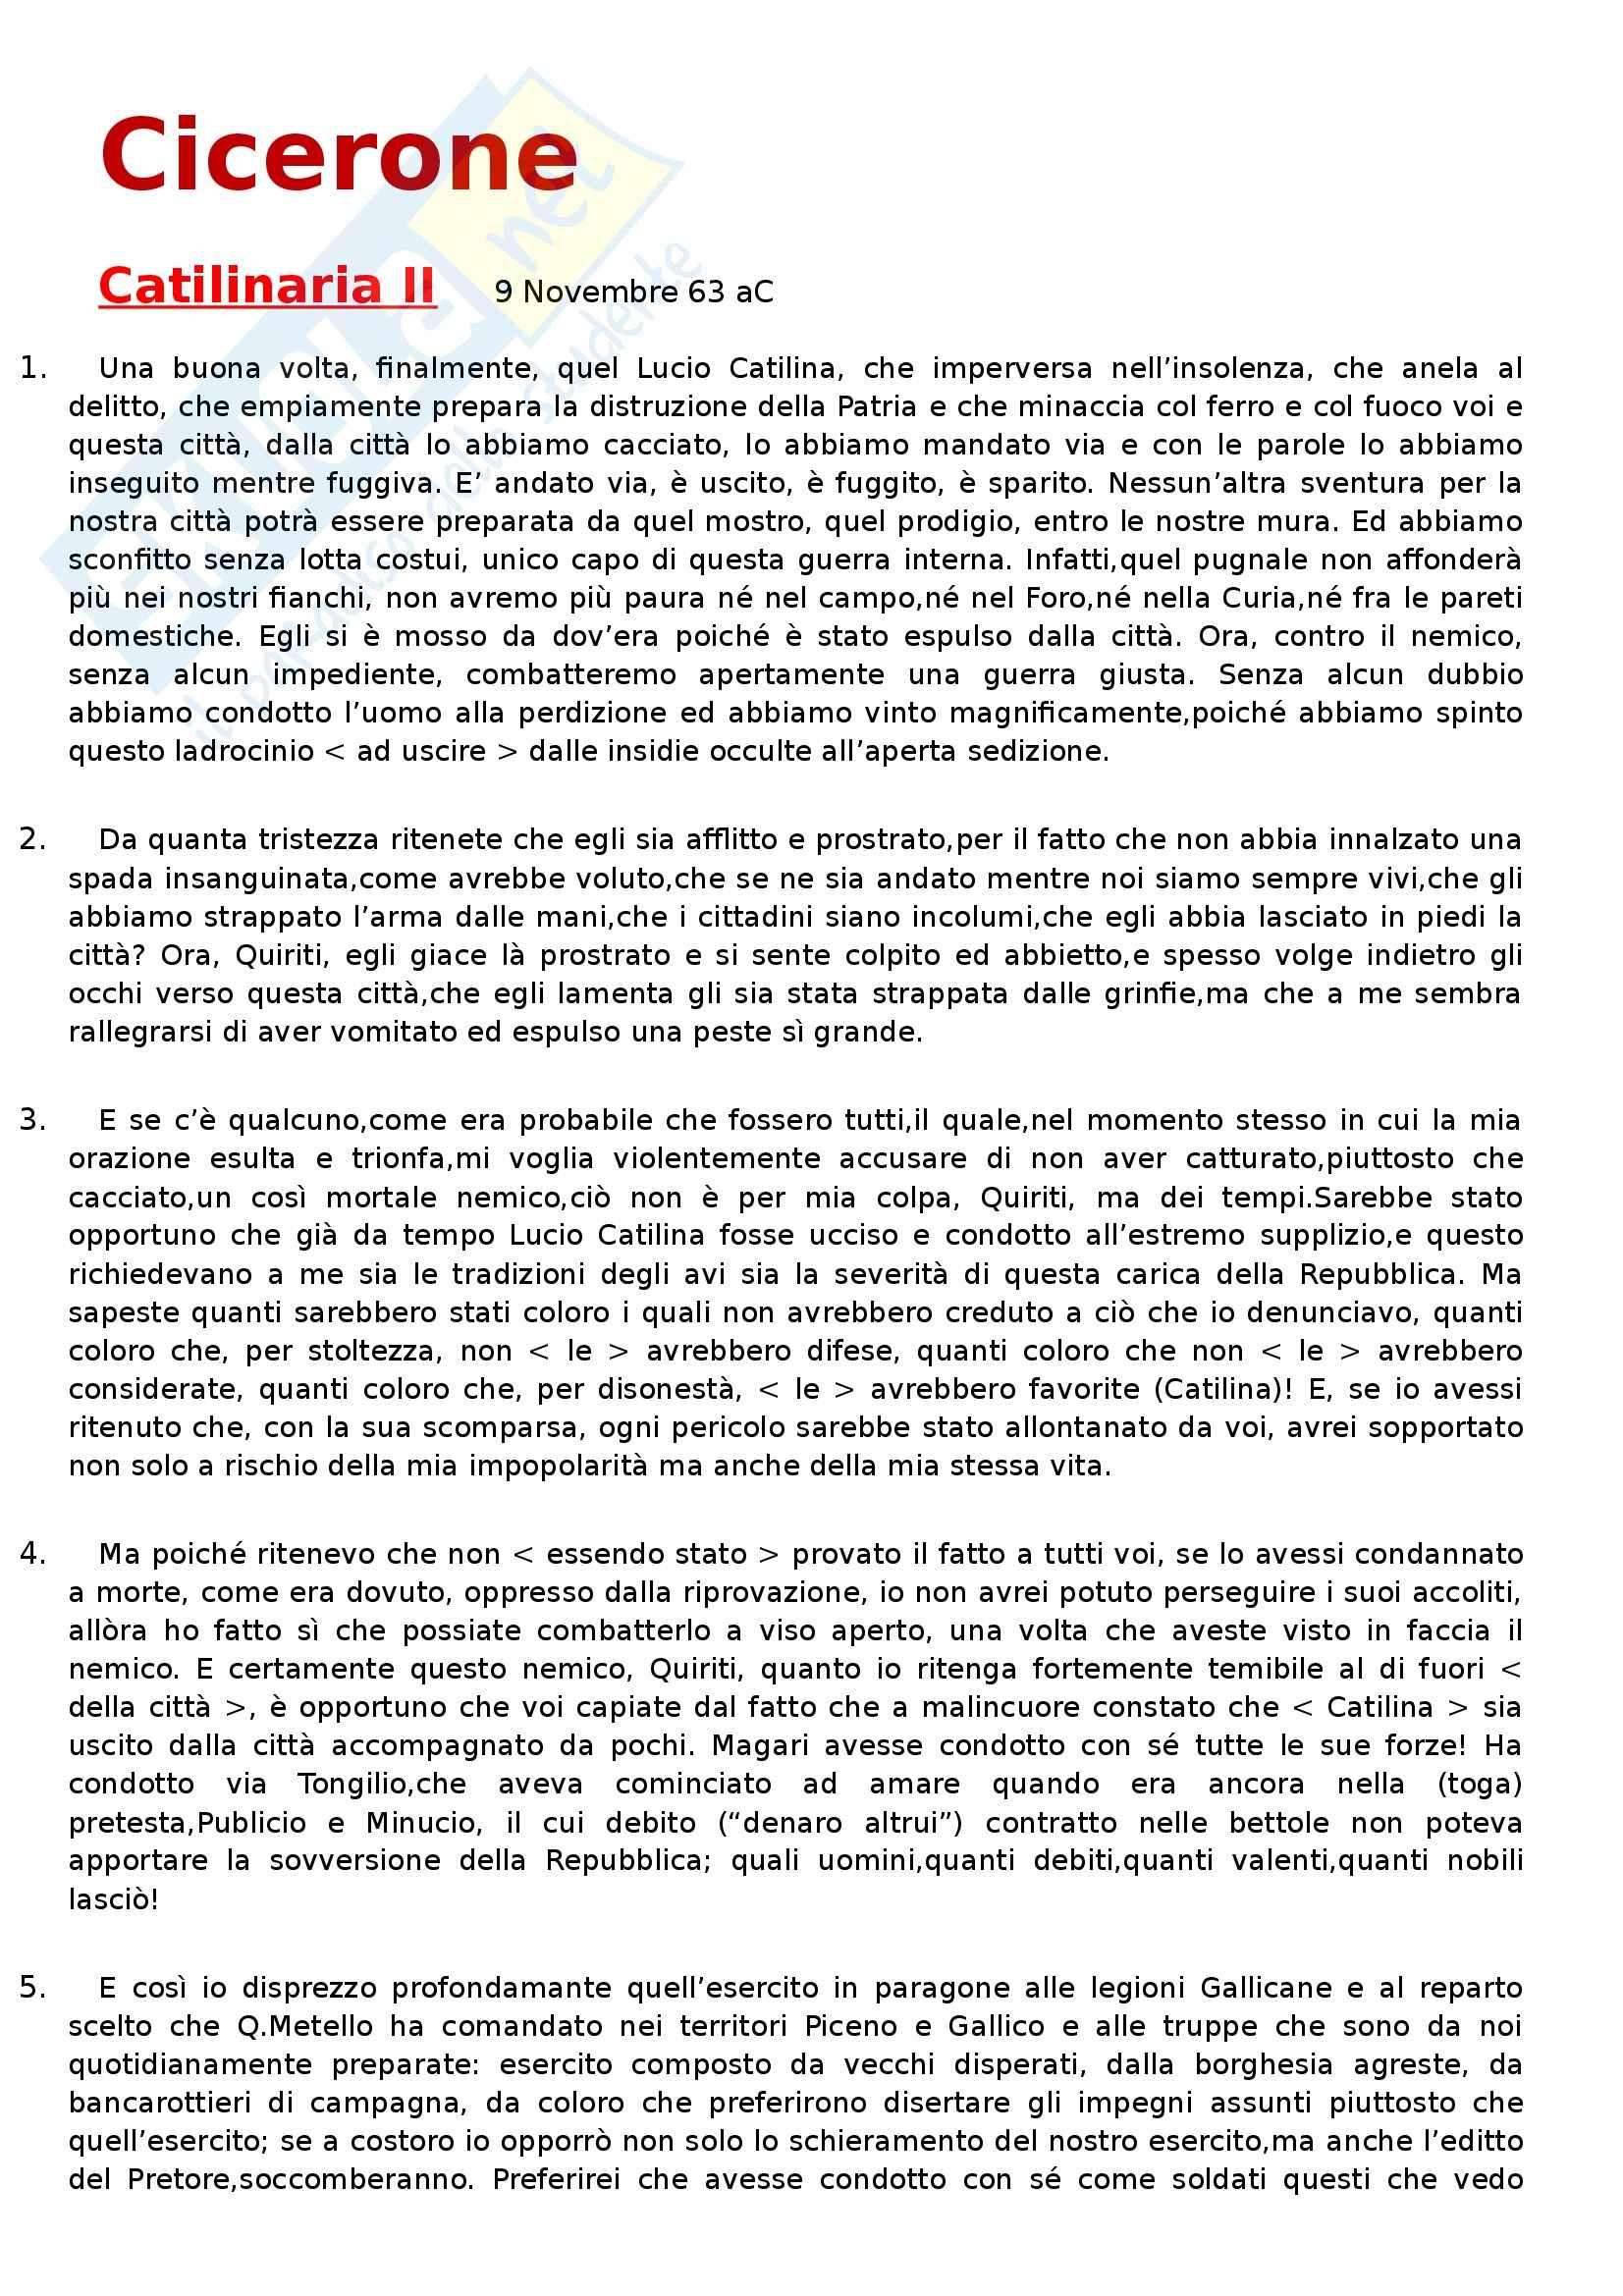 Letteratura latina  - Cicerone, Catilinaria II